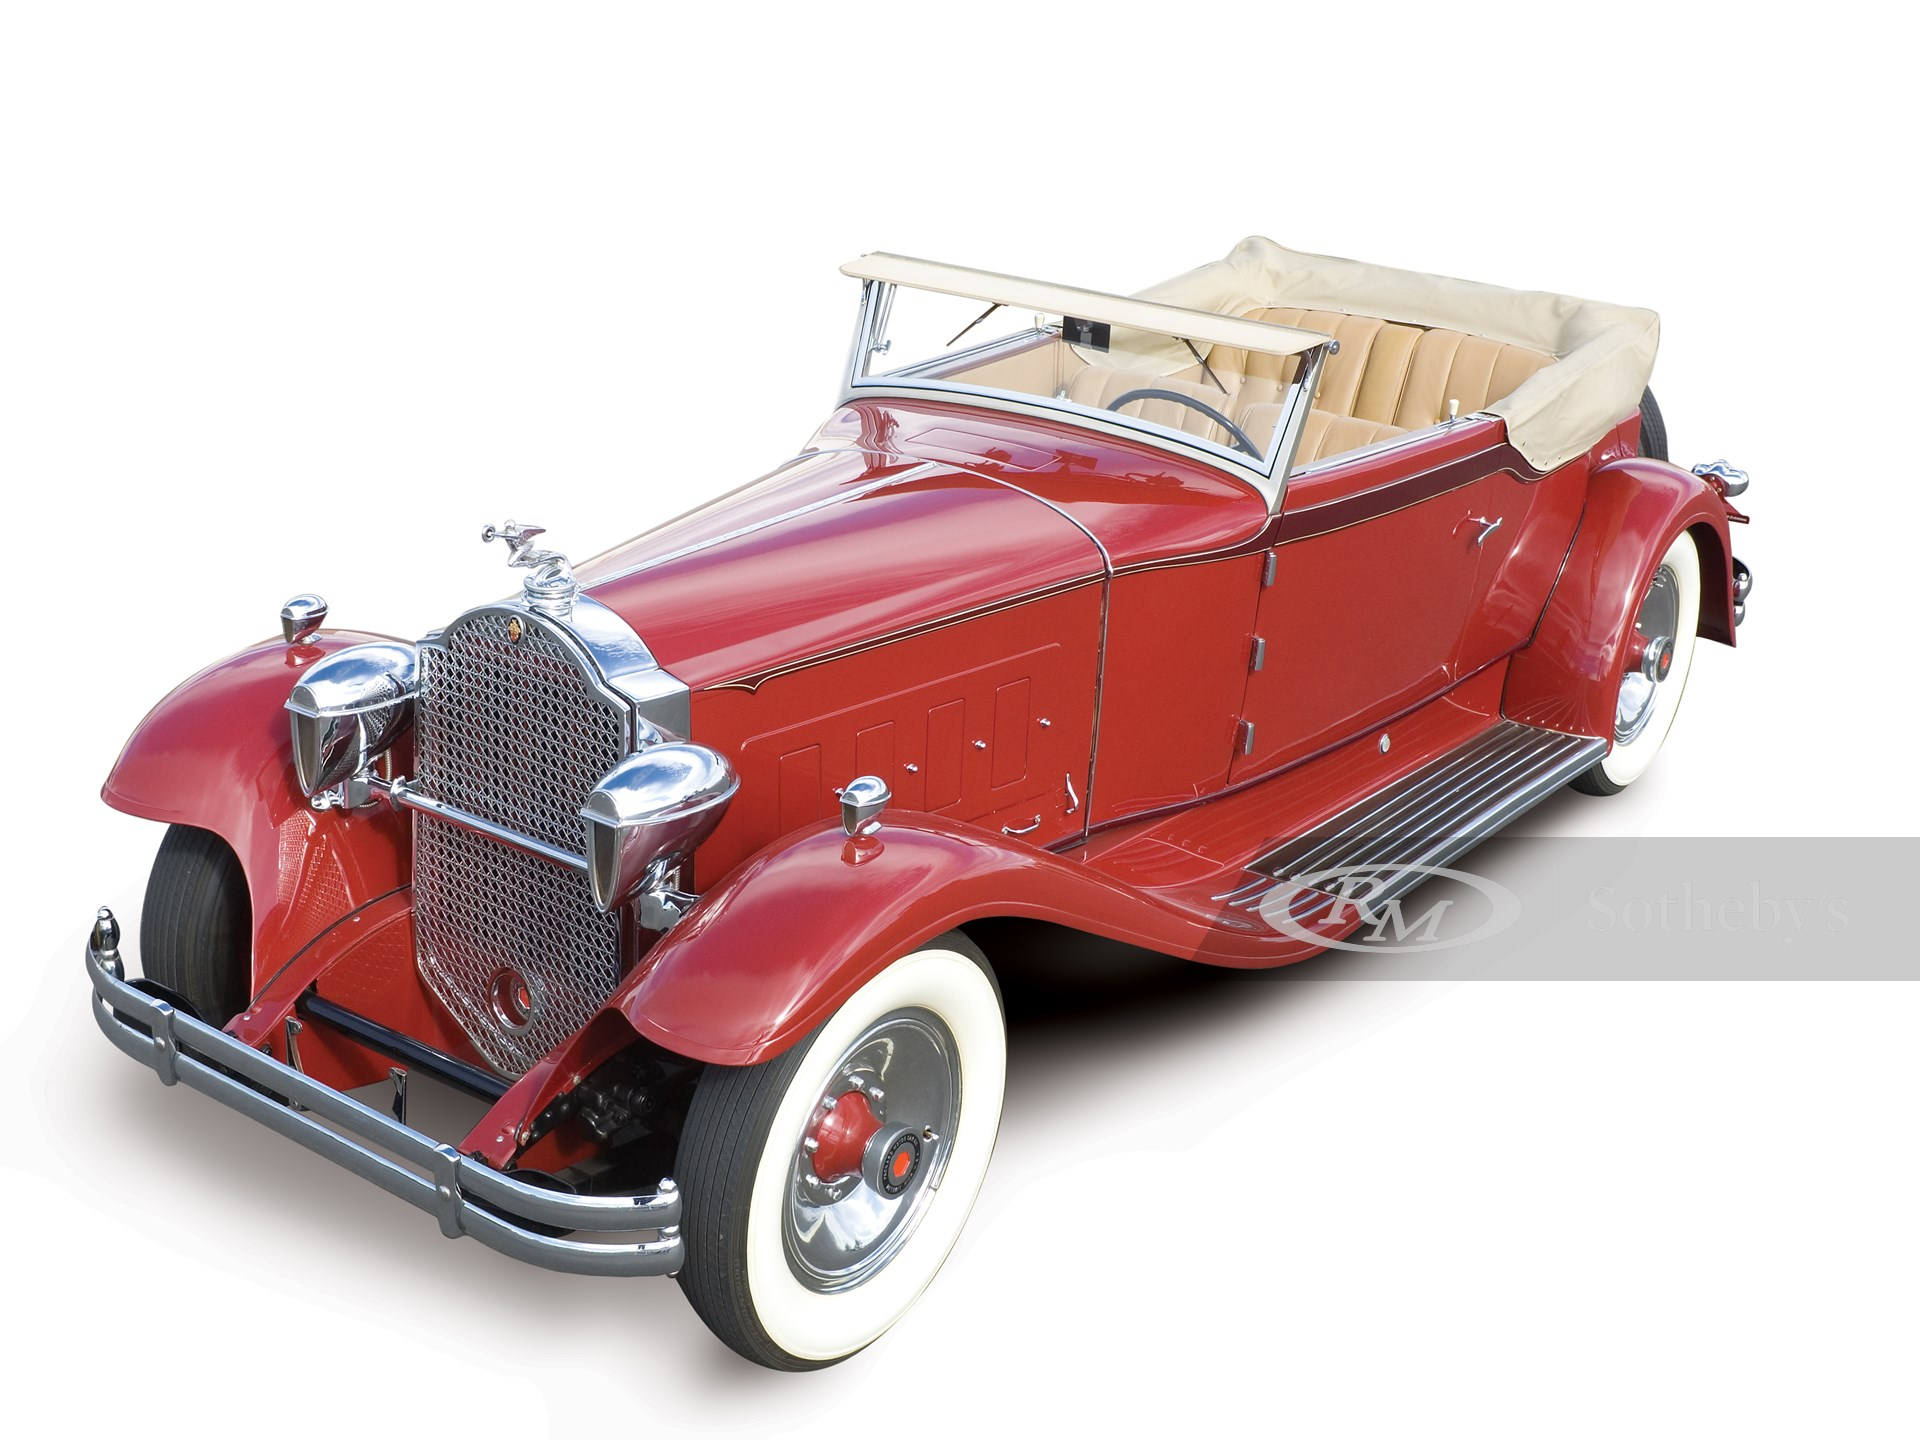 1931 Packard Deluxe Eight Convertible Victoria